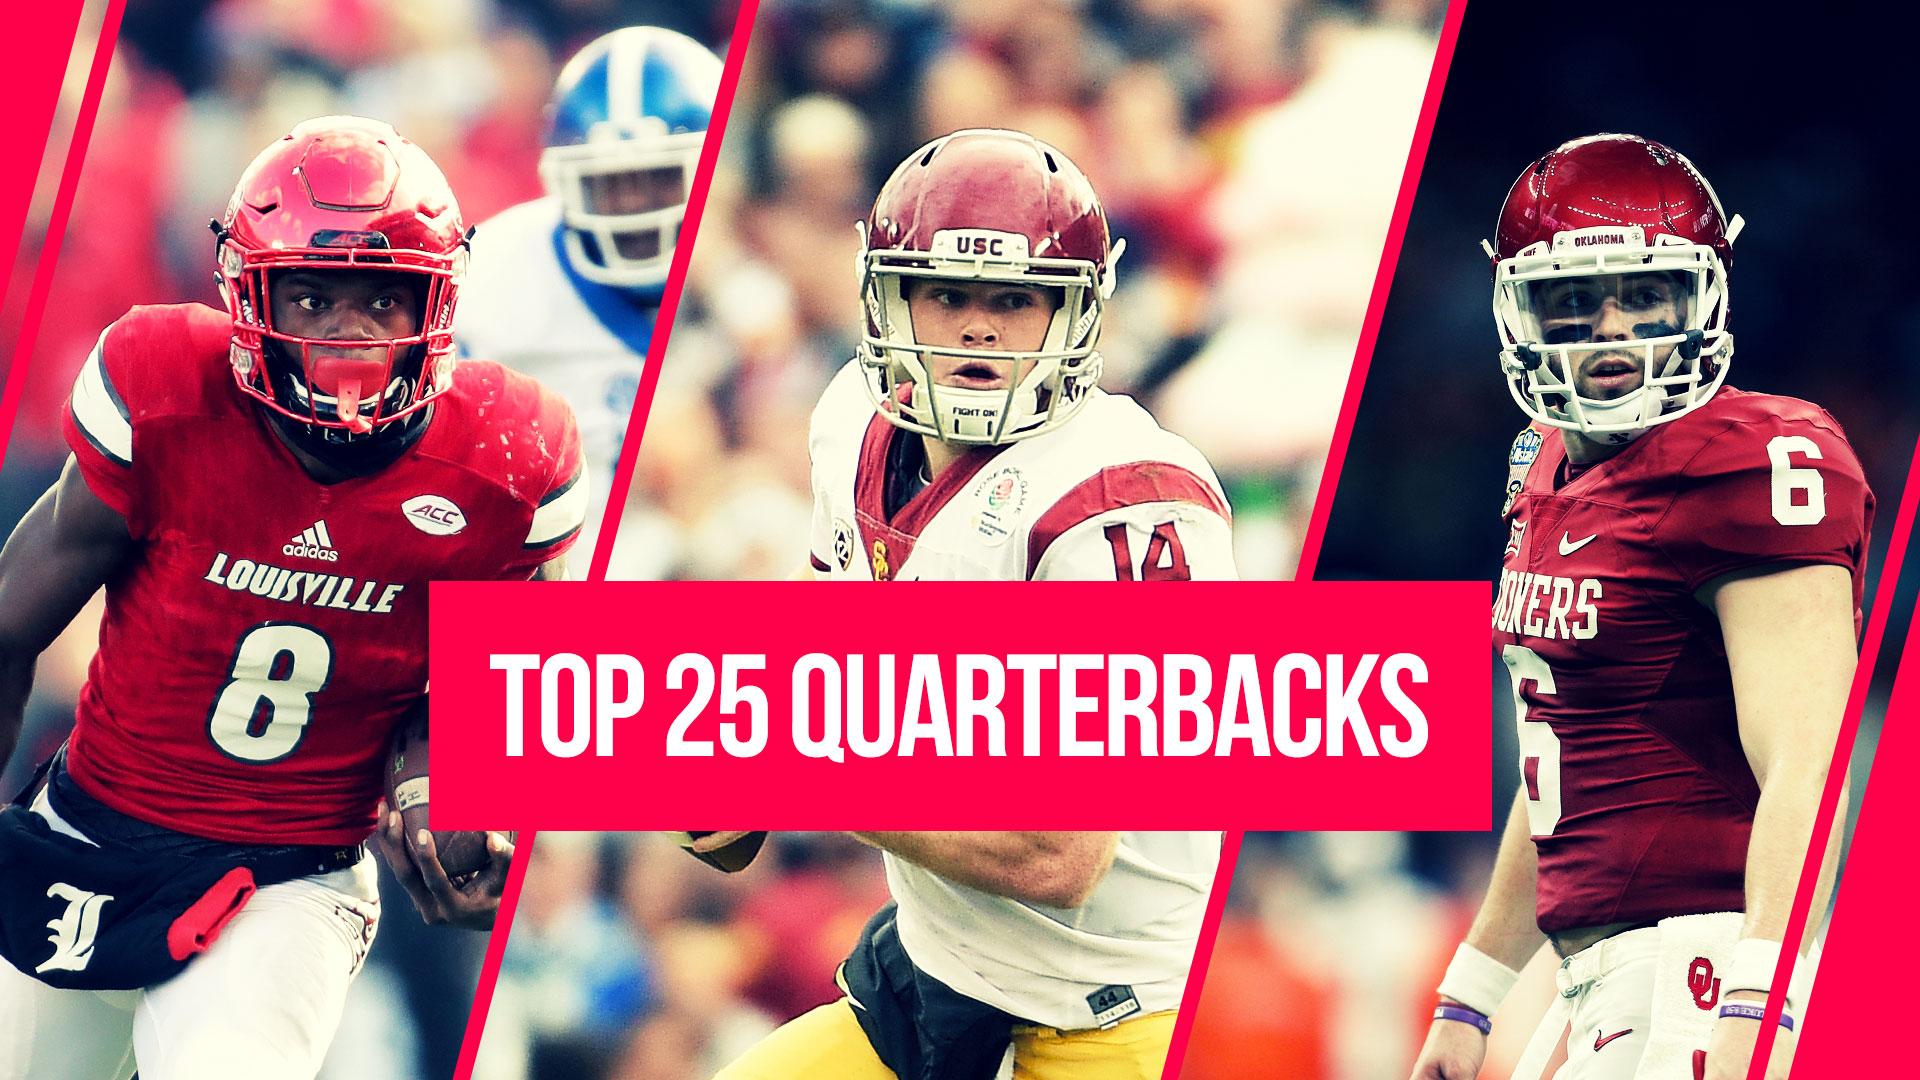 College football's Top 25 quarterbacks for 2017: Lamar ...